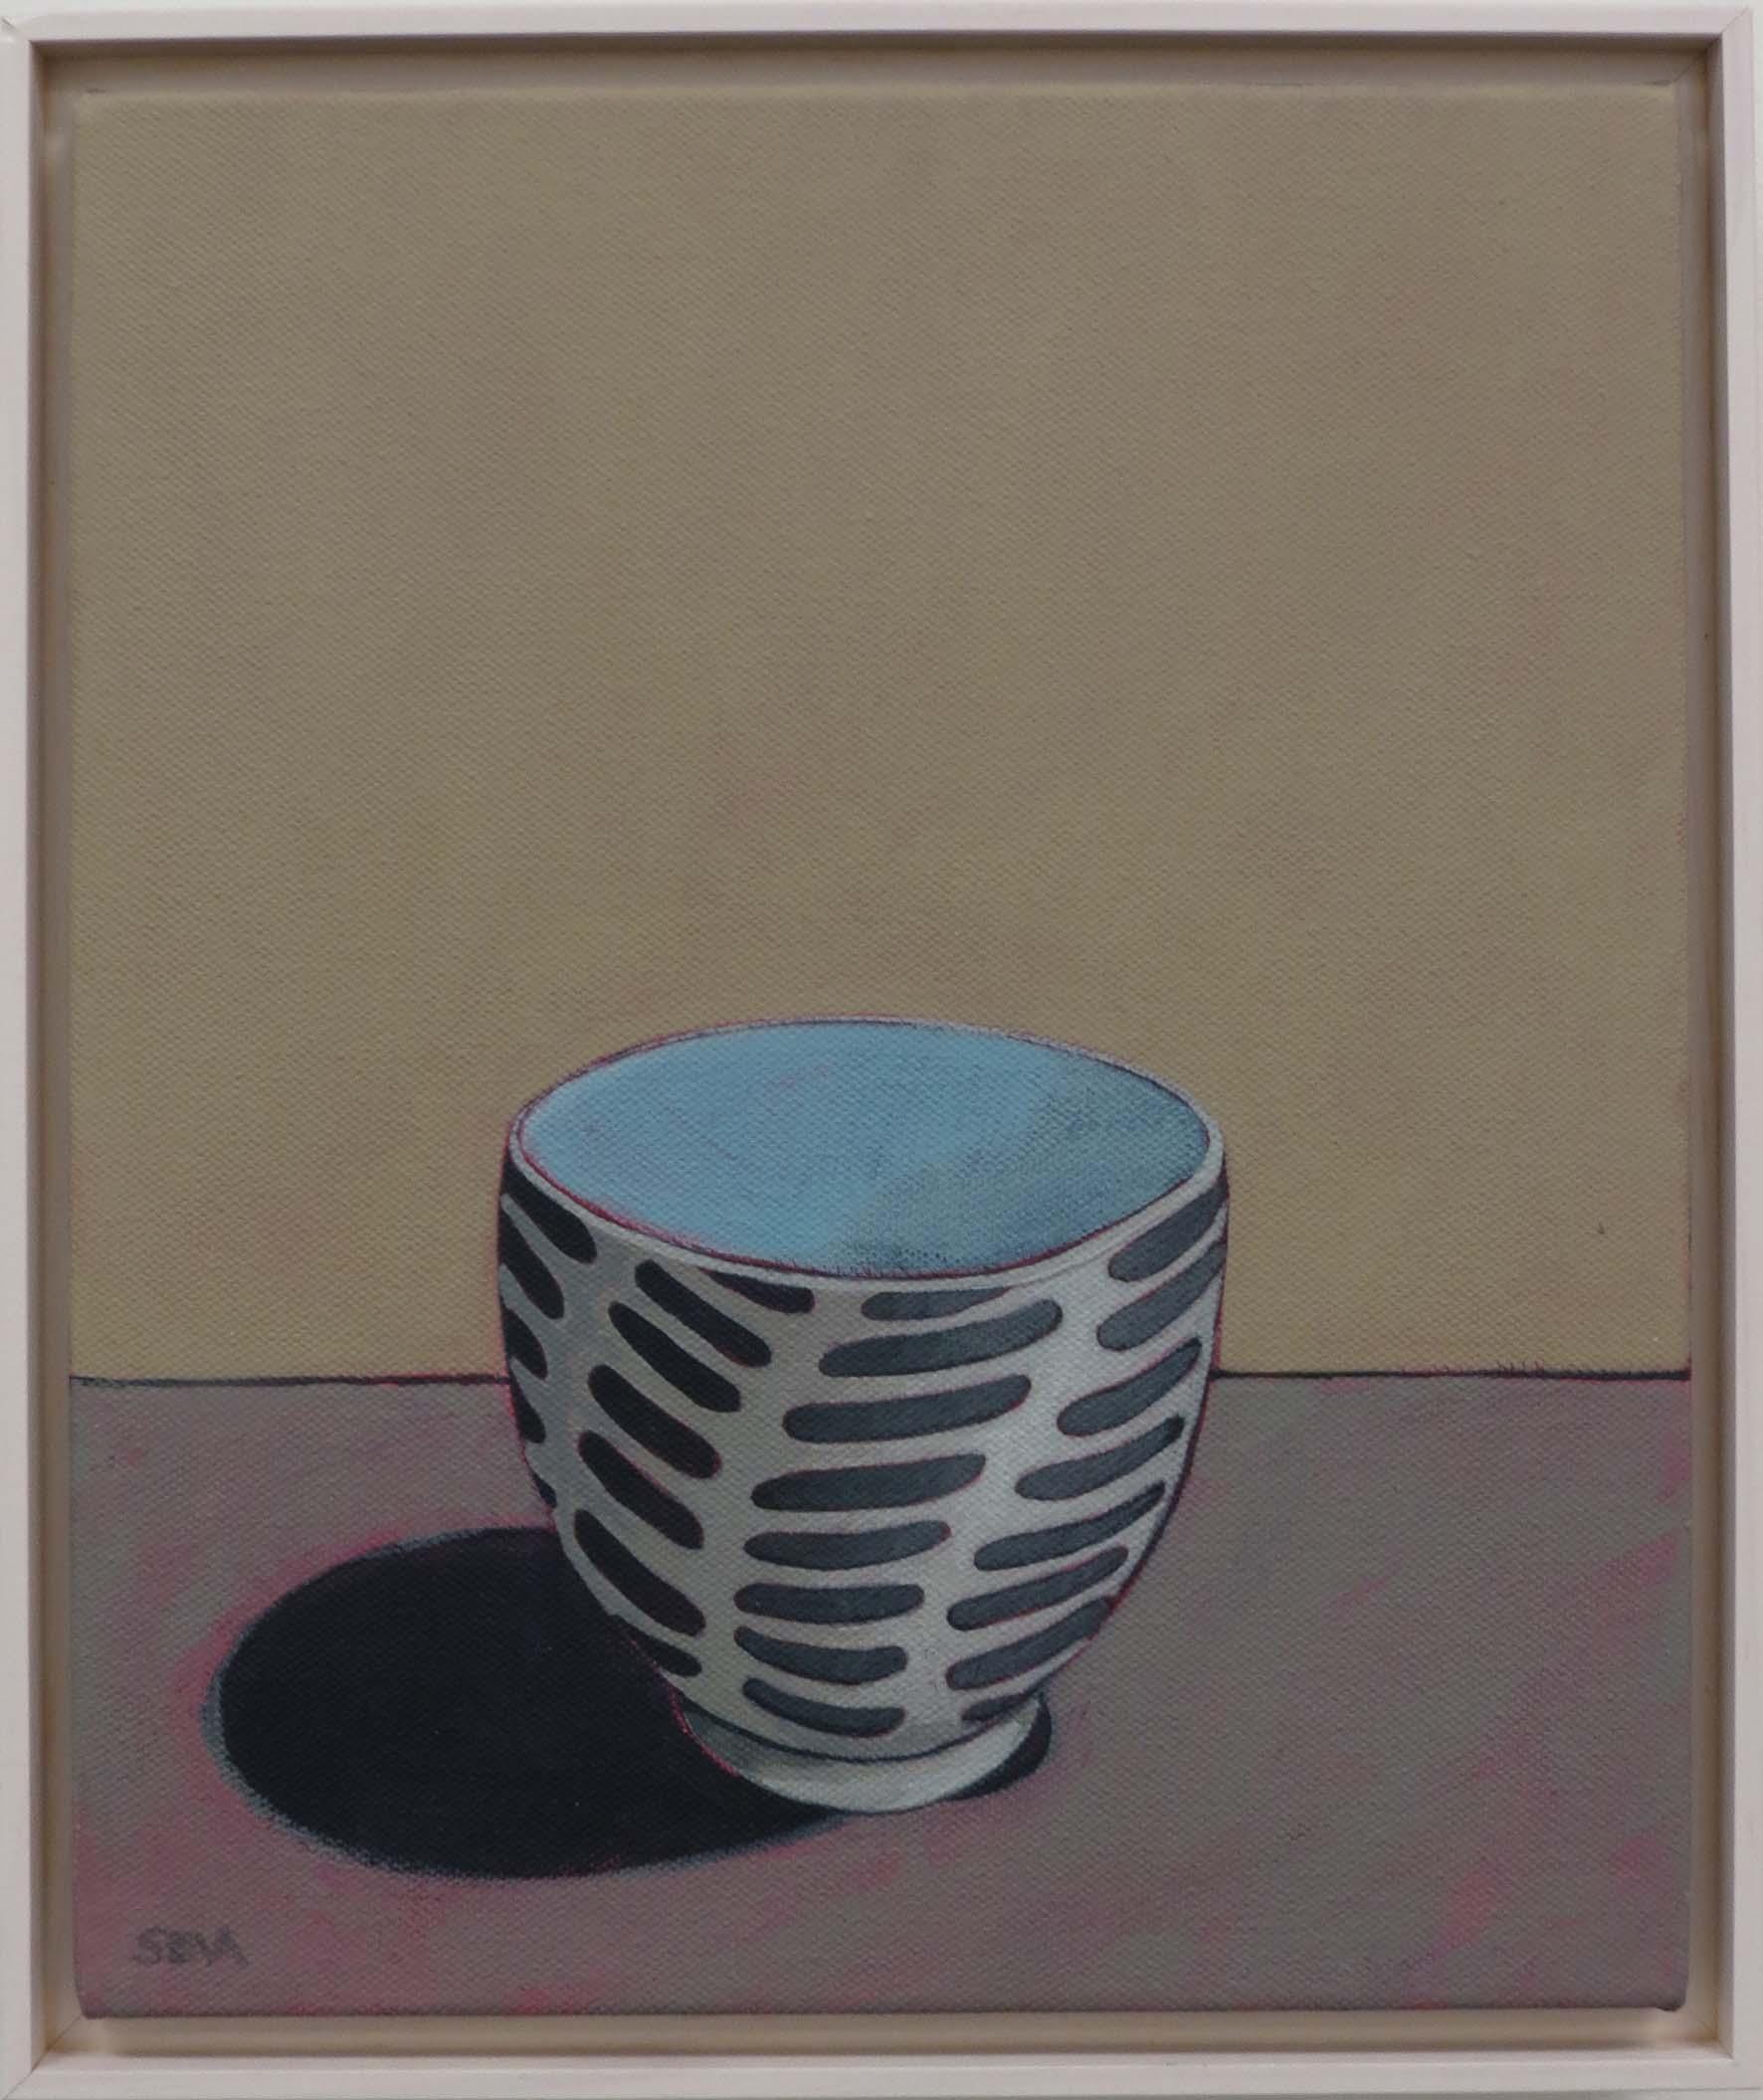 7. Sue Eva, 'Black, White', 2018, Acrylic on canvas, 30 x 25cm, $345